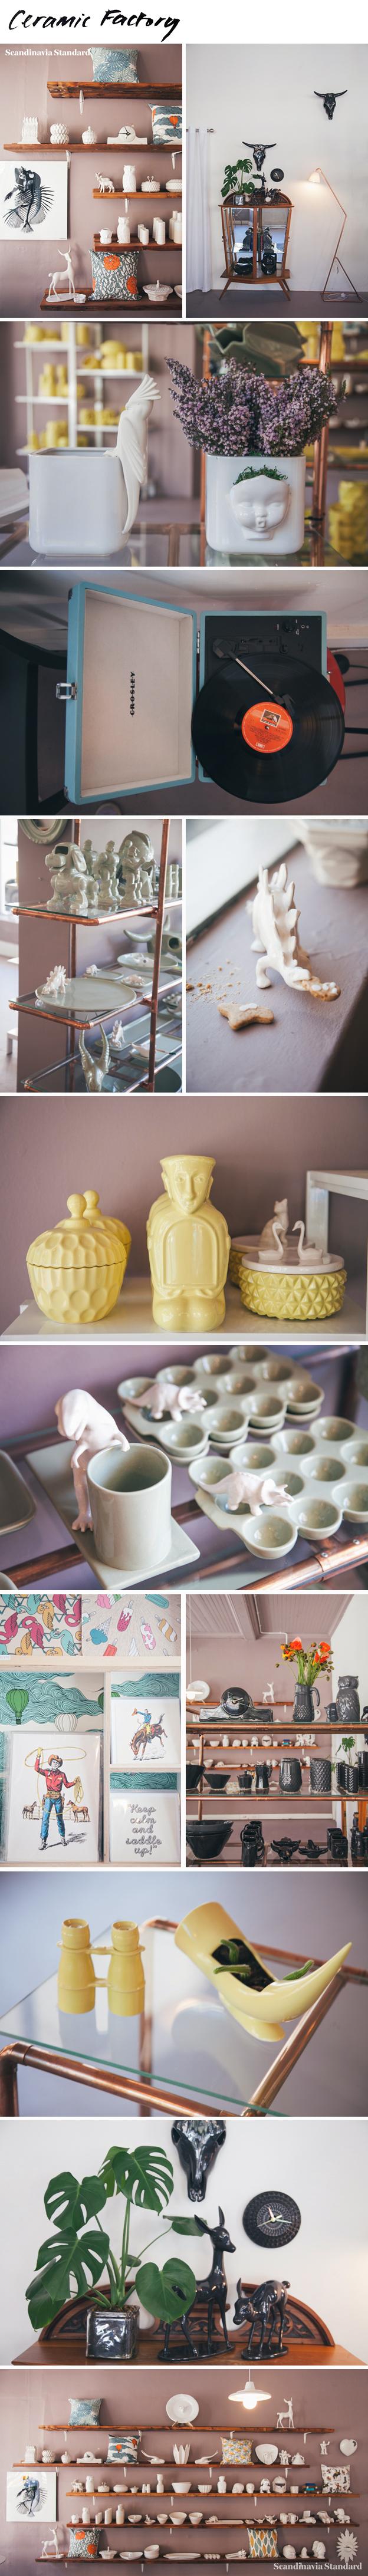 SCANDI SIX Scandinavian Spots in Cape Town - Ceramic Factory Kloof St